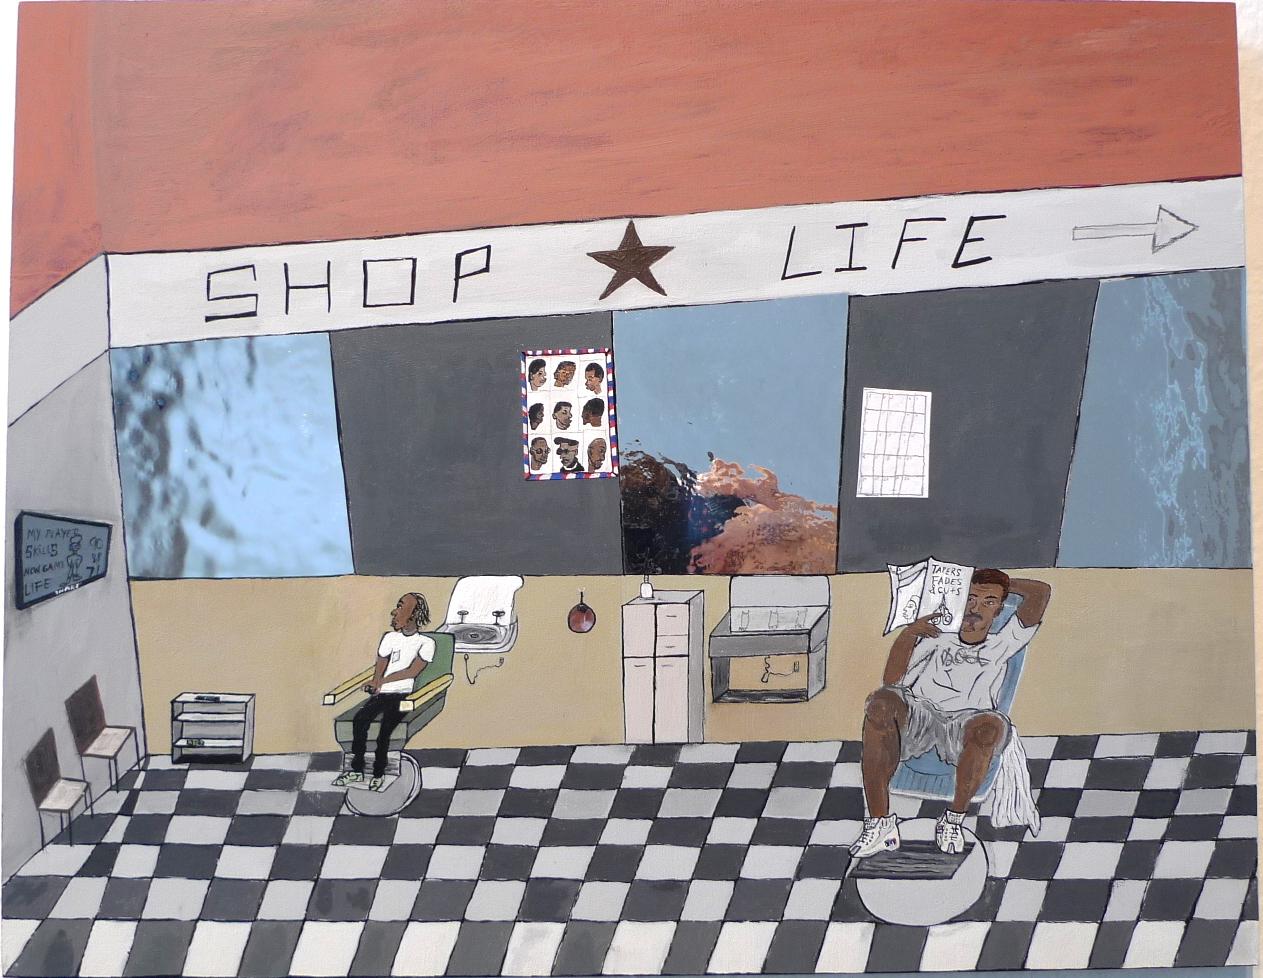 Yarrow_Shop Life.jpg